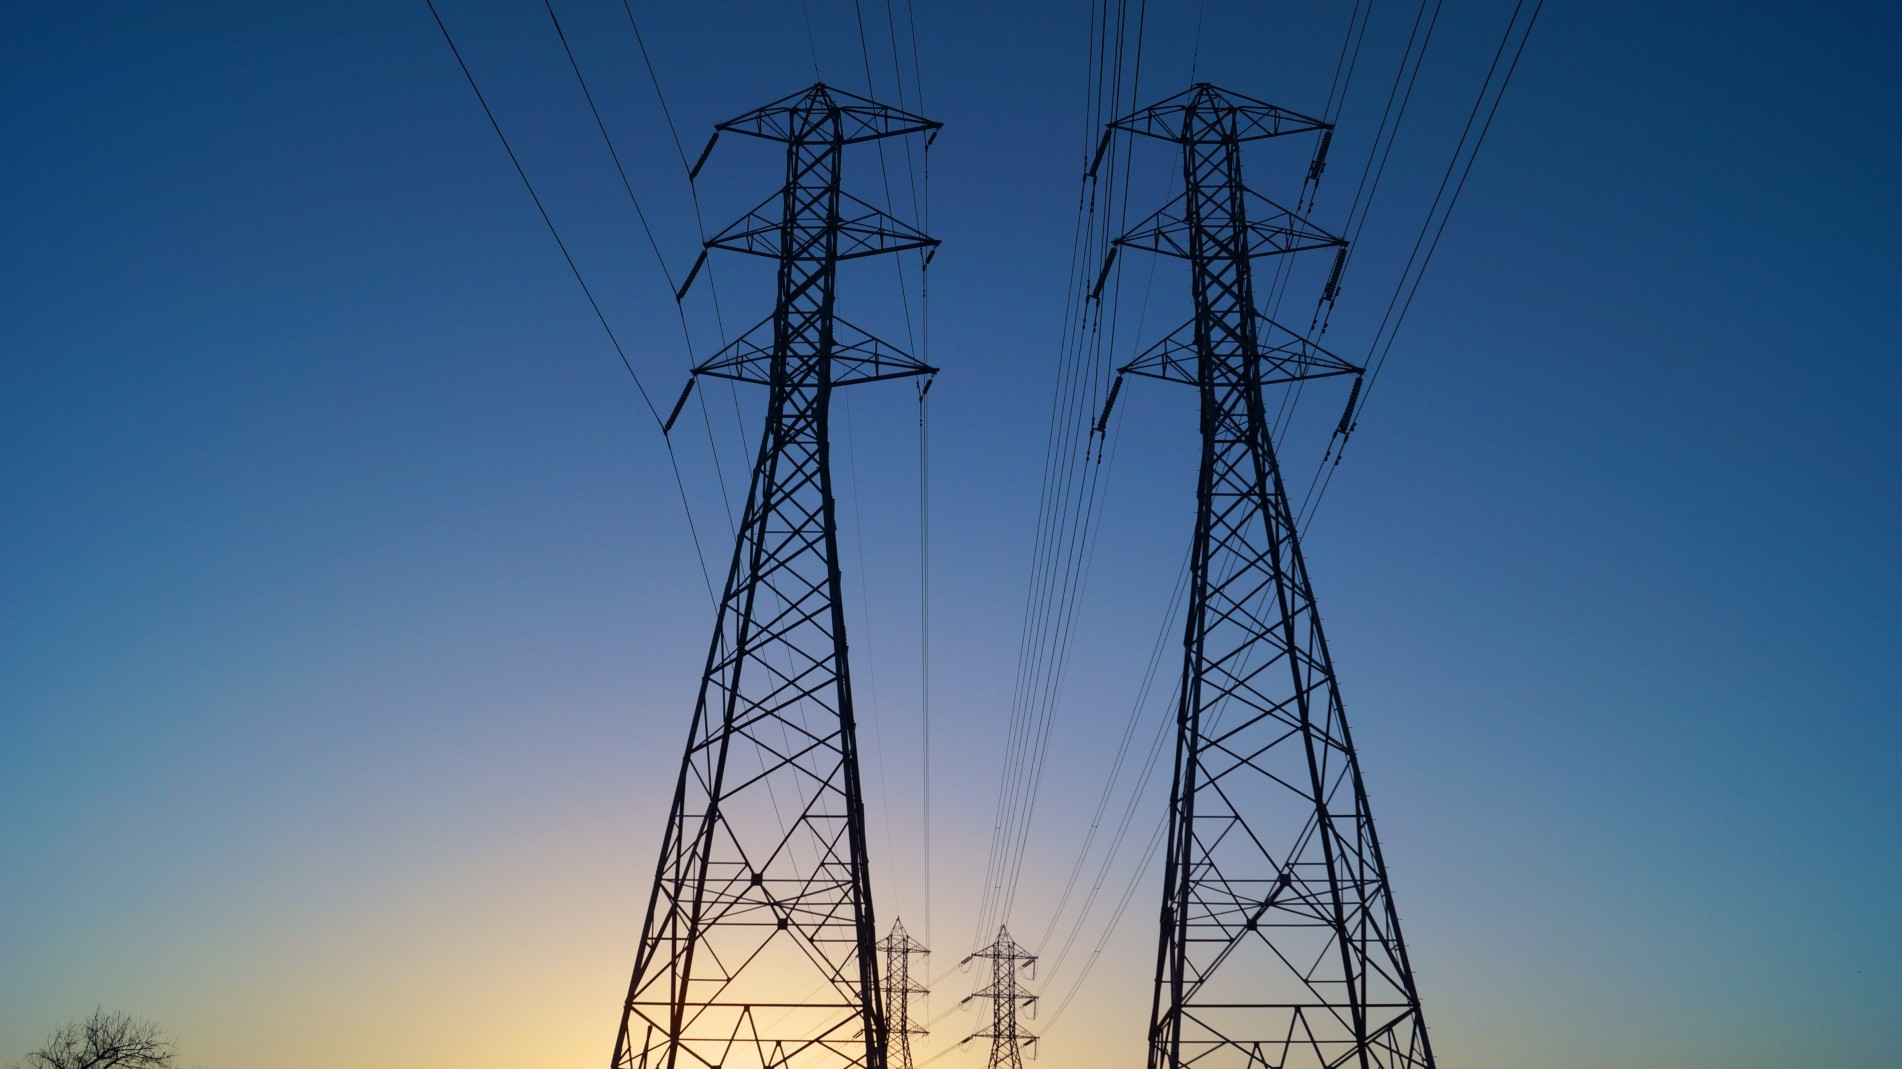 electrical-power-lines_1541612845052.jpg